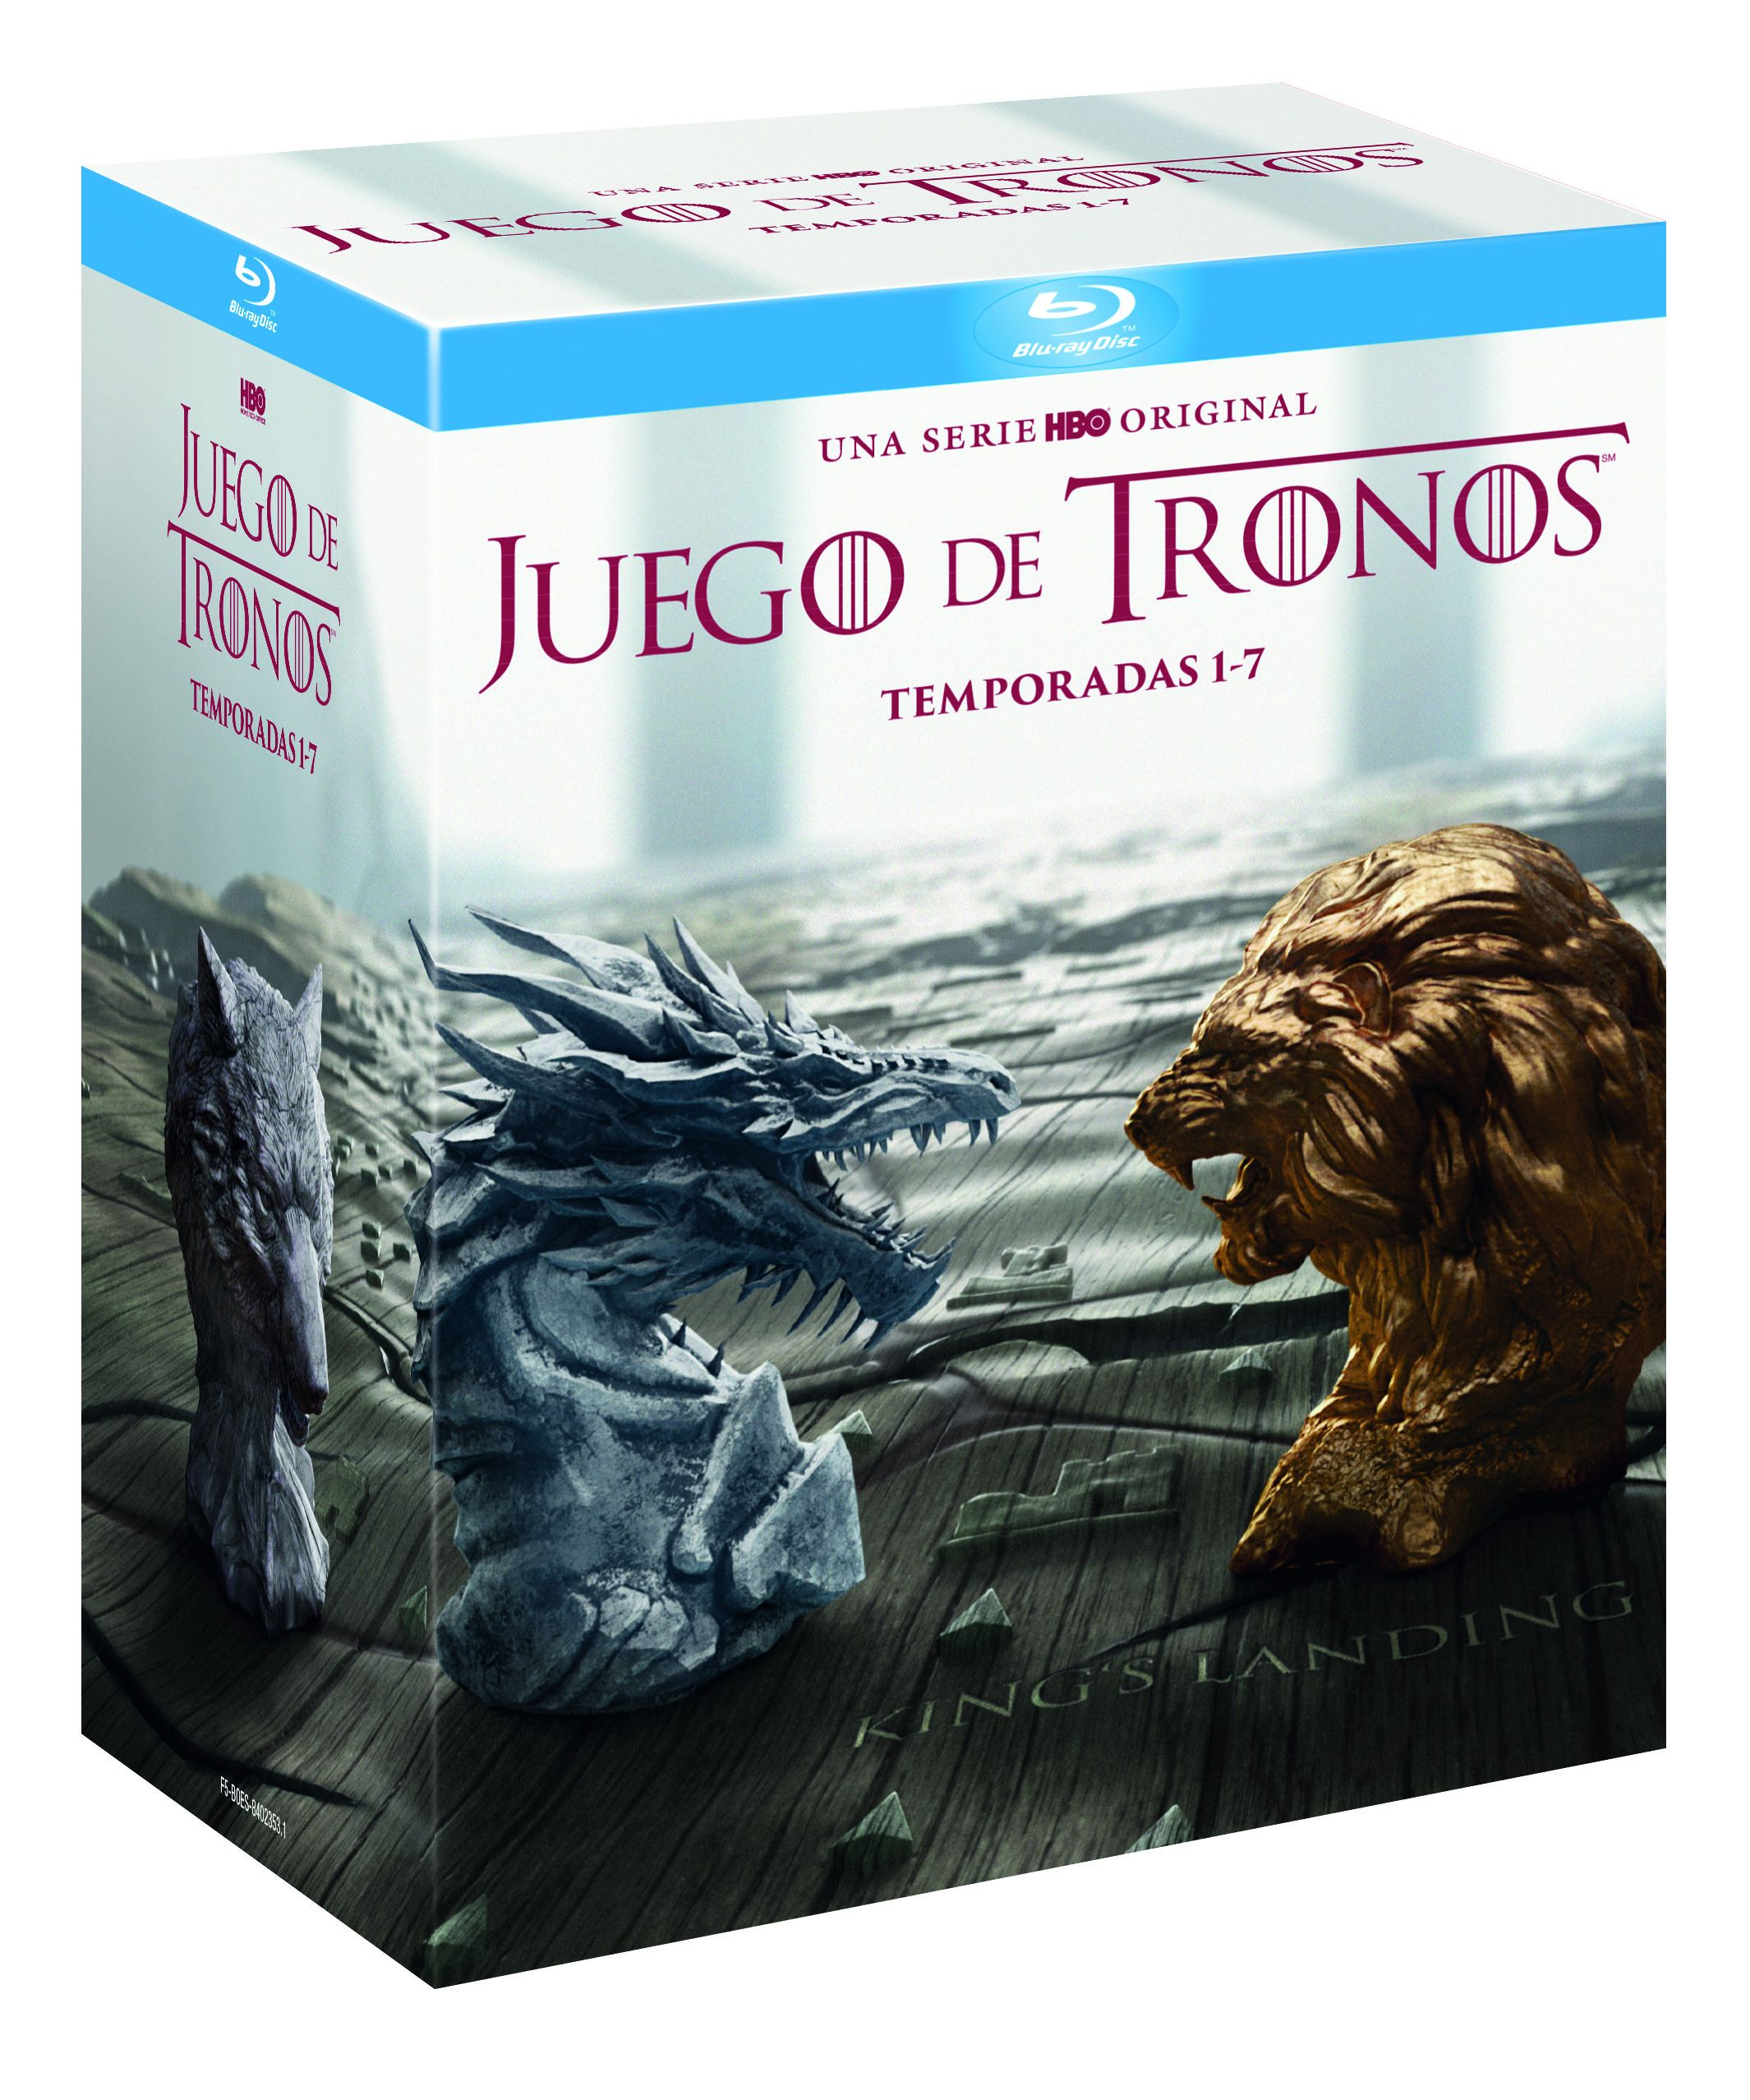 juego de tronos - blu ray - temporada 1-7-8420266010810